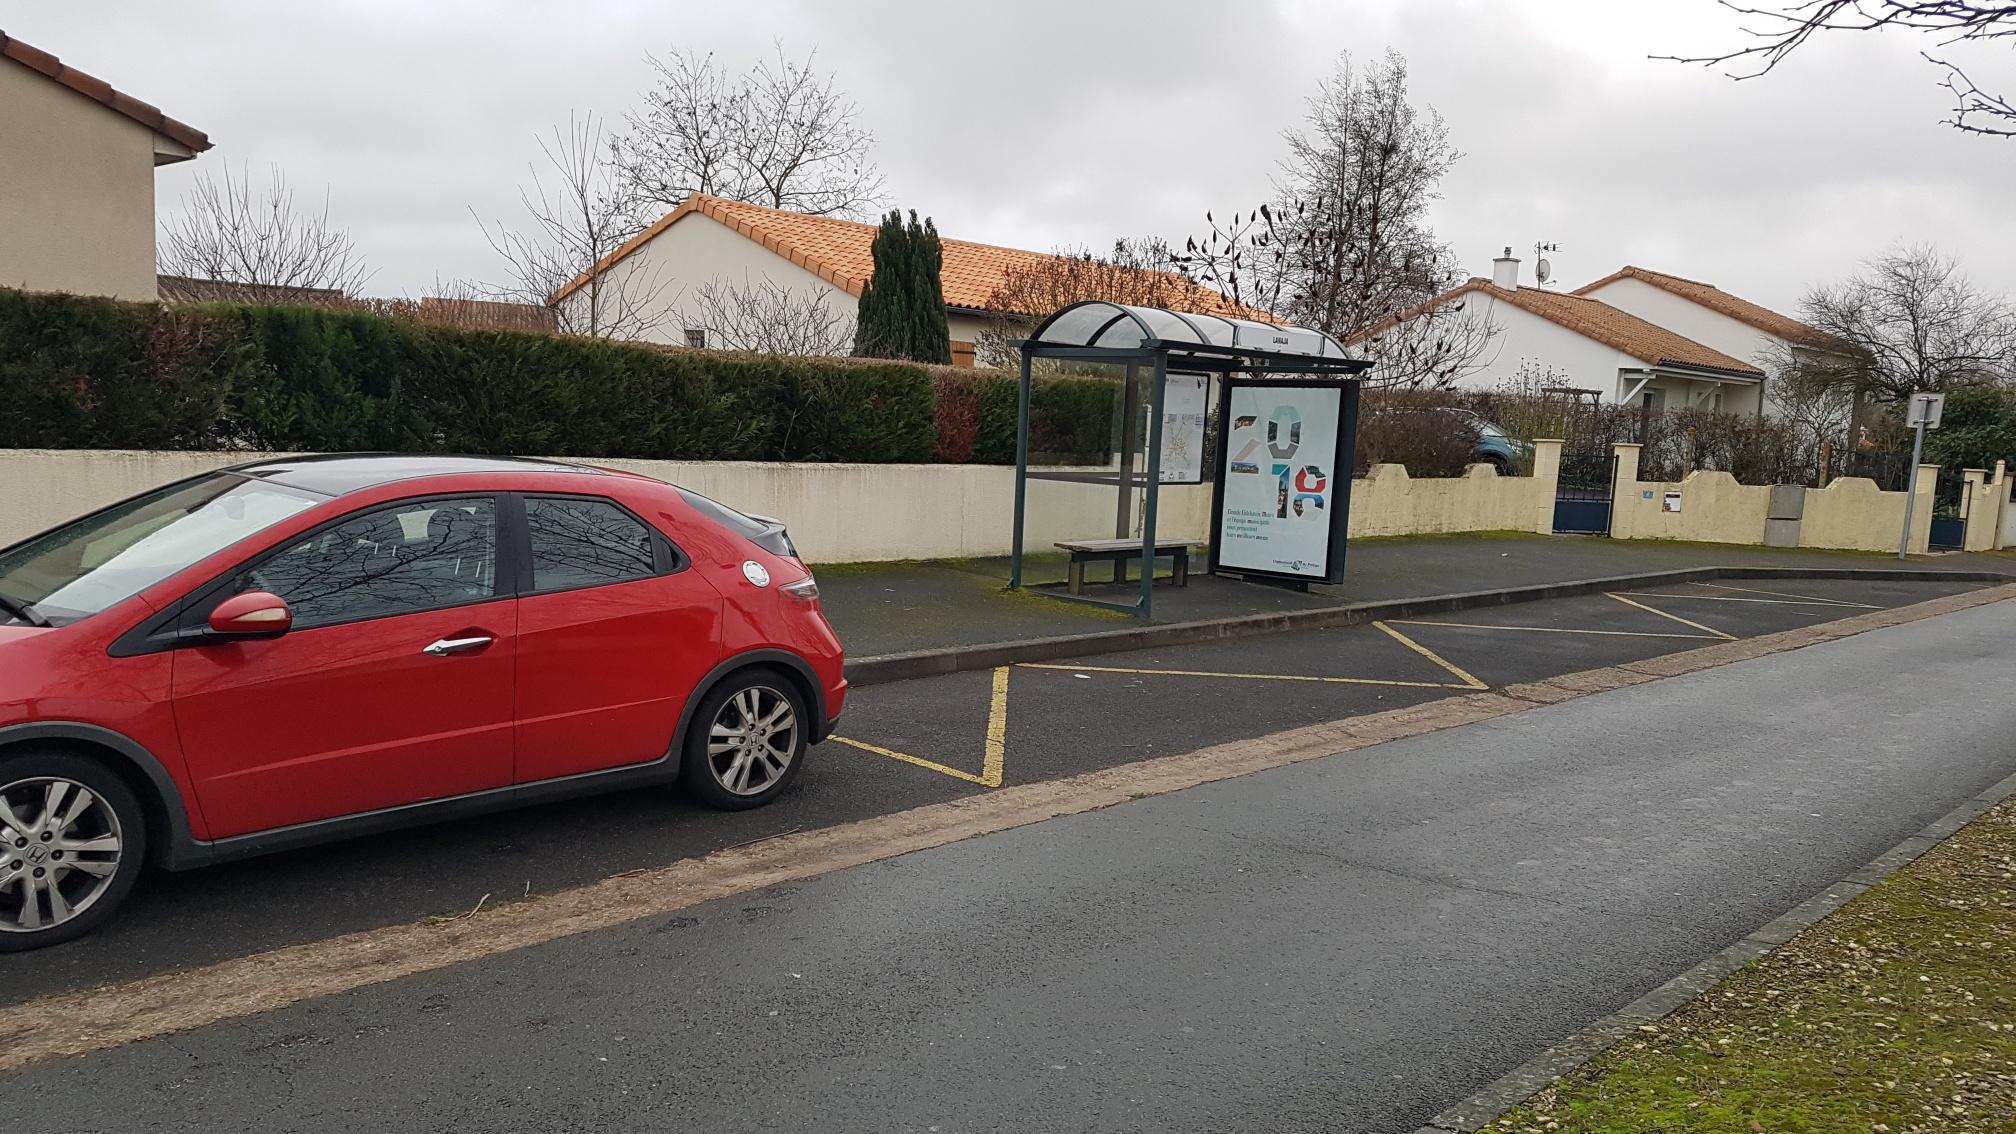 Pv Stationnement Devant Zizag Jaune Stationnement Auto Evasion Forum Auto